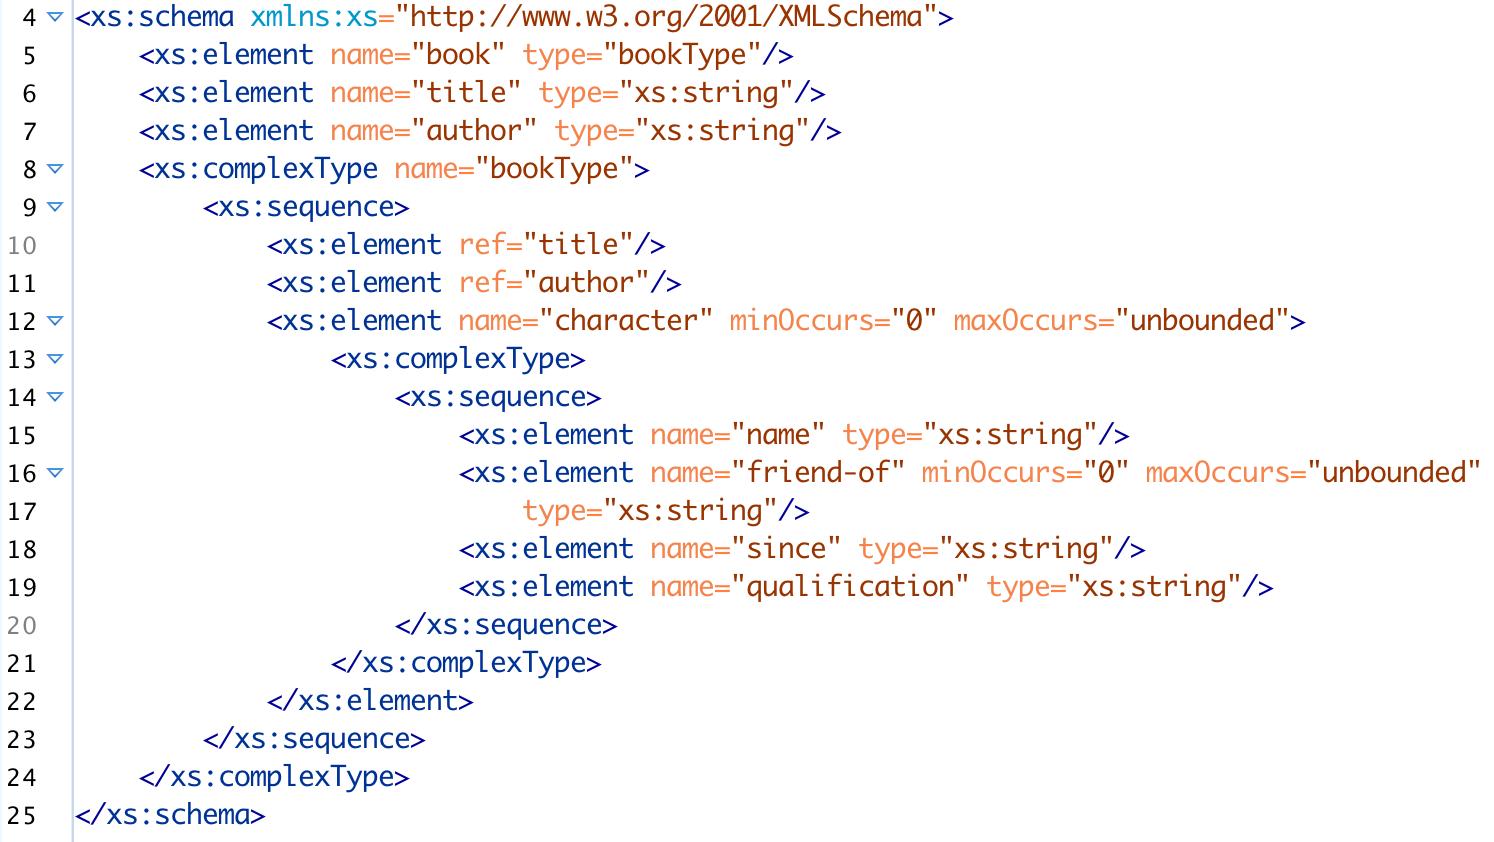 Balisage: Four Basic Building Principles (Patterns) for XML Schemas